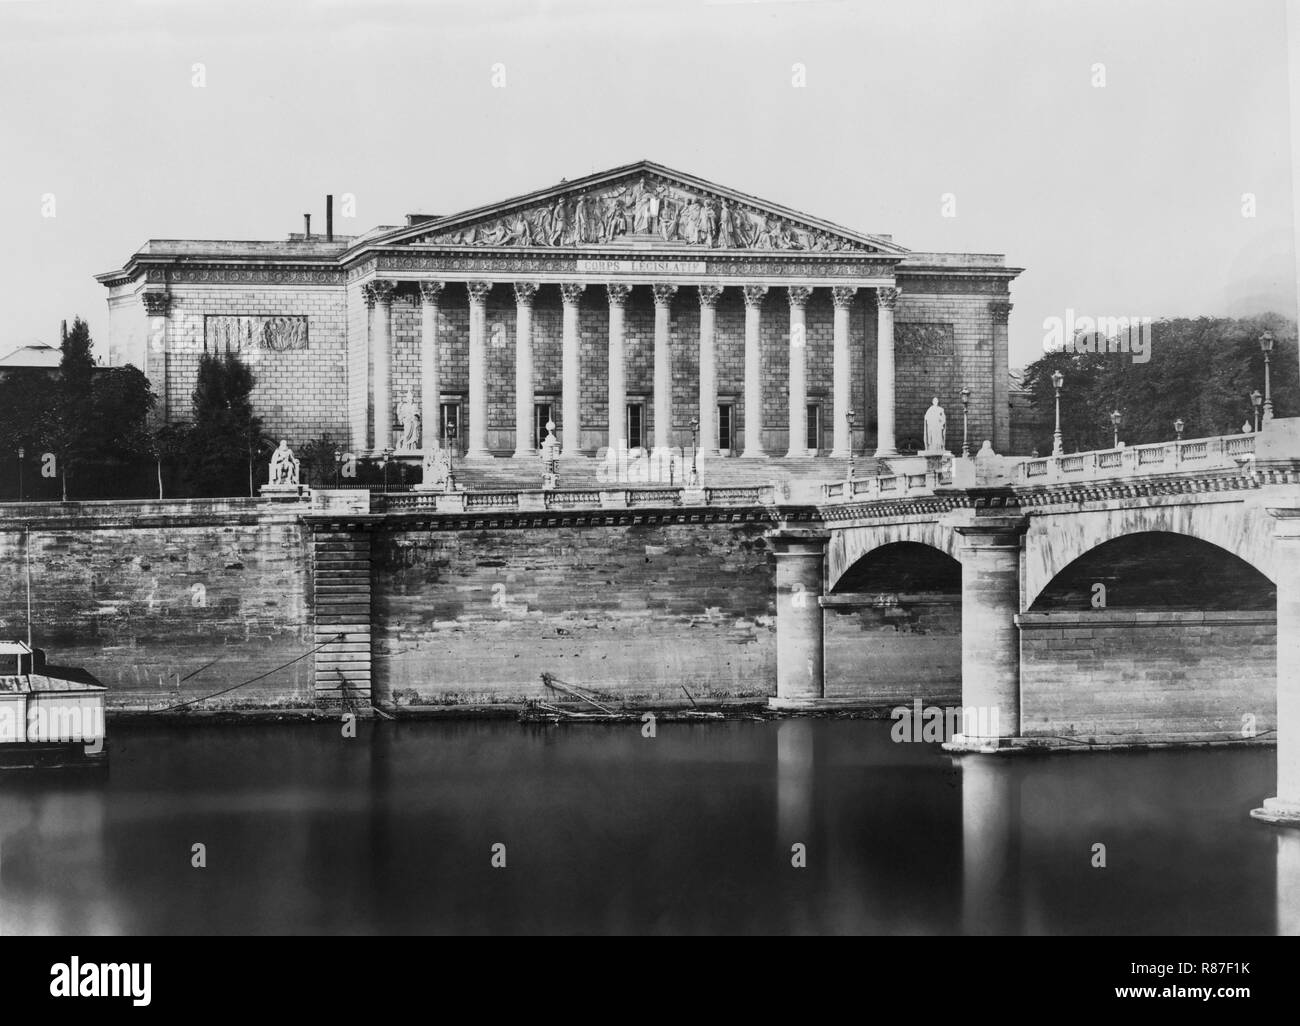 Corps Legislatif, Paris, France, Silver Albumen Print, Edouard Baldus, 1860's - Stock Image